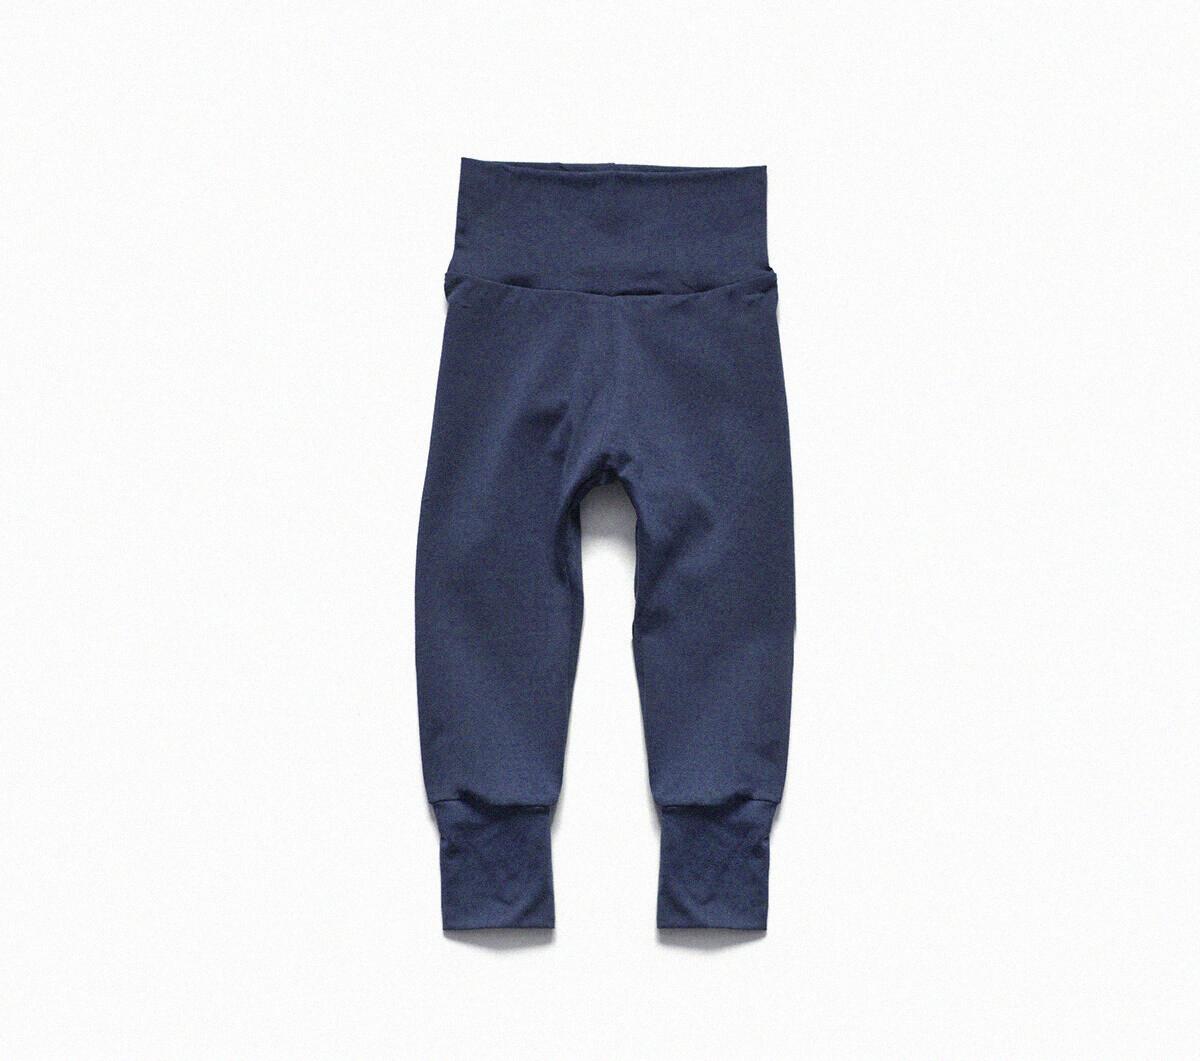 Organic Cotton Little Sprout Pants™   Grow With Me Leggings   Denim Blue